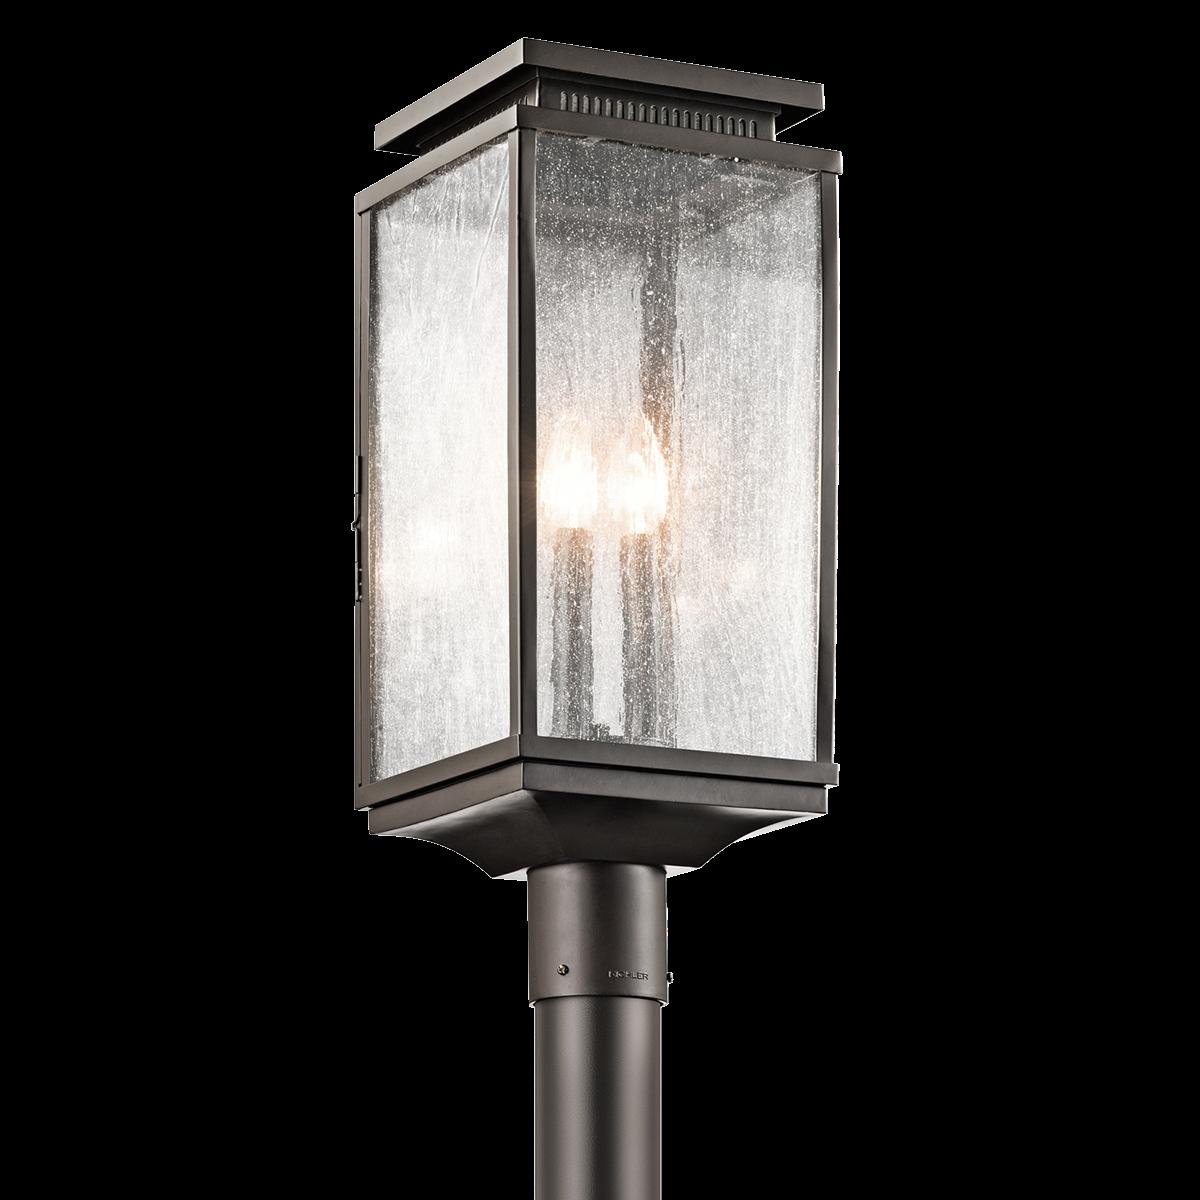 Lamp clipart outdoor lamp. Post lights light mount